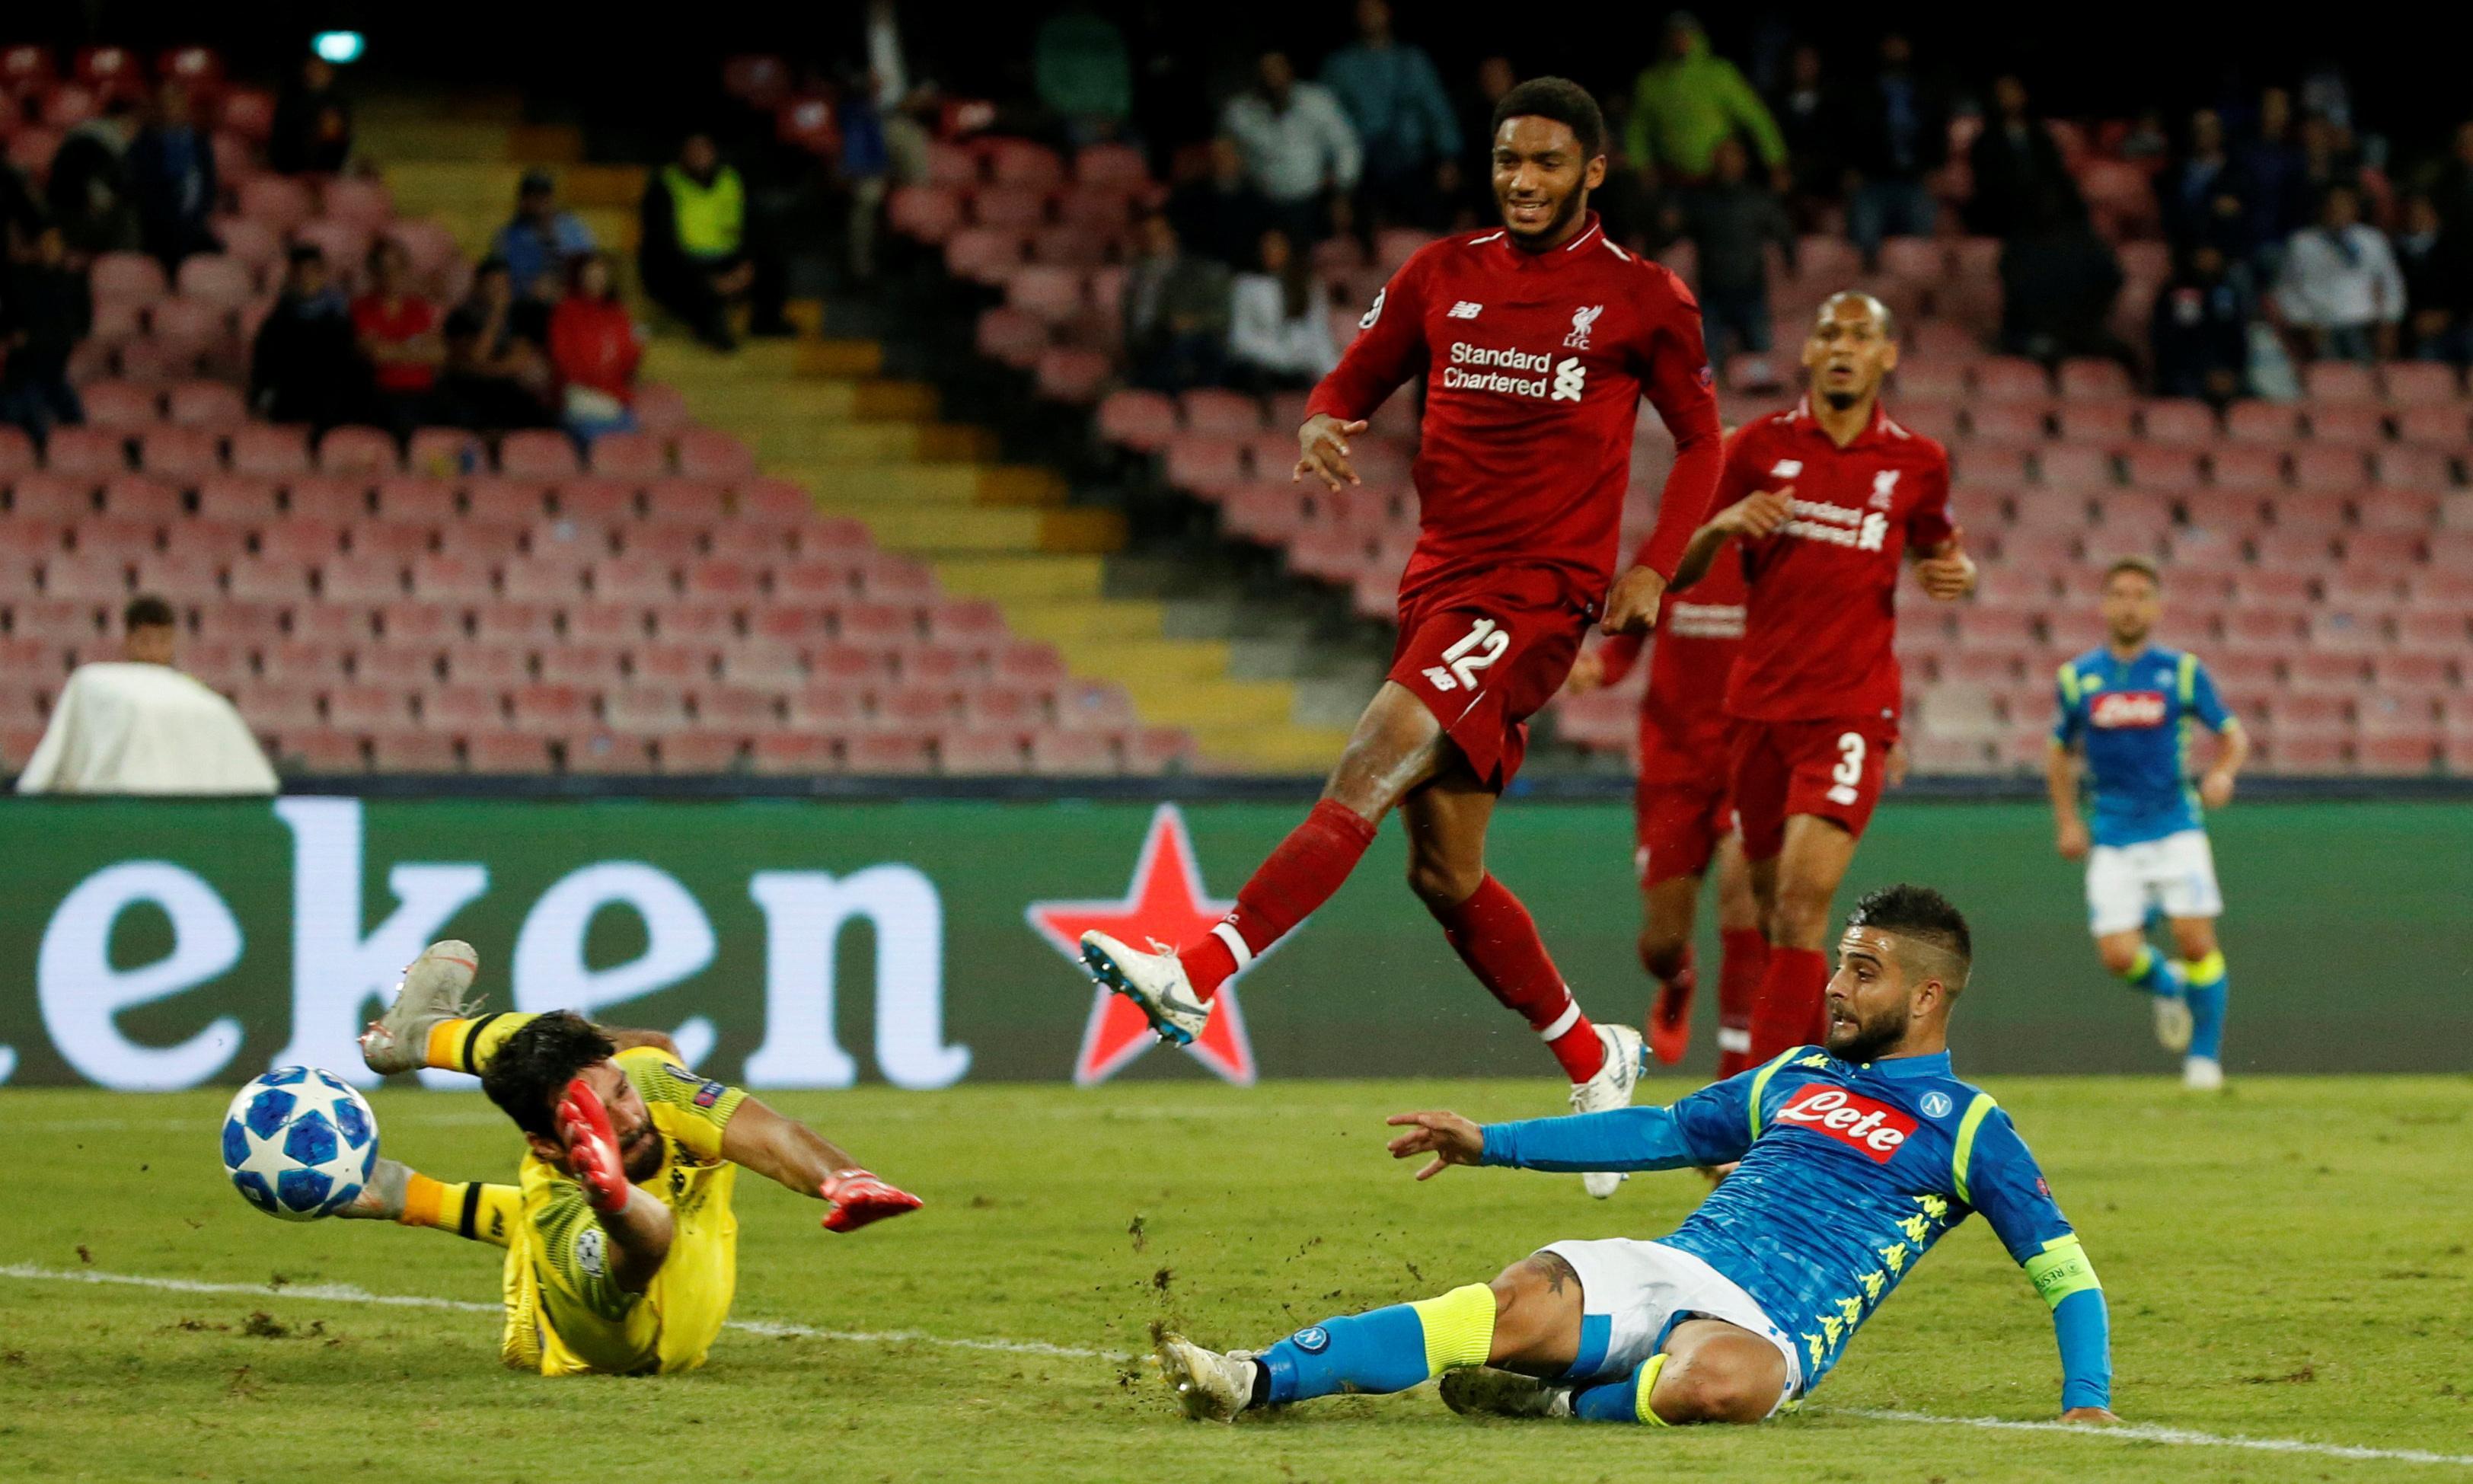 Jürgen Klopp's Liverpool land in Italy intent on defending their crown